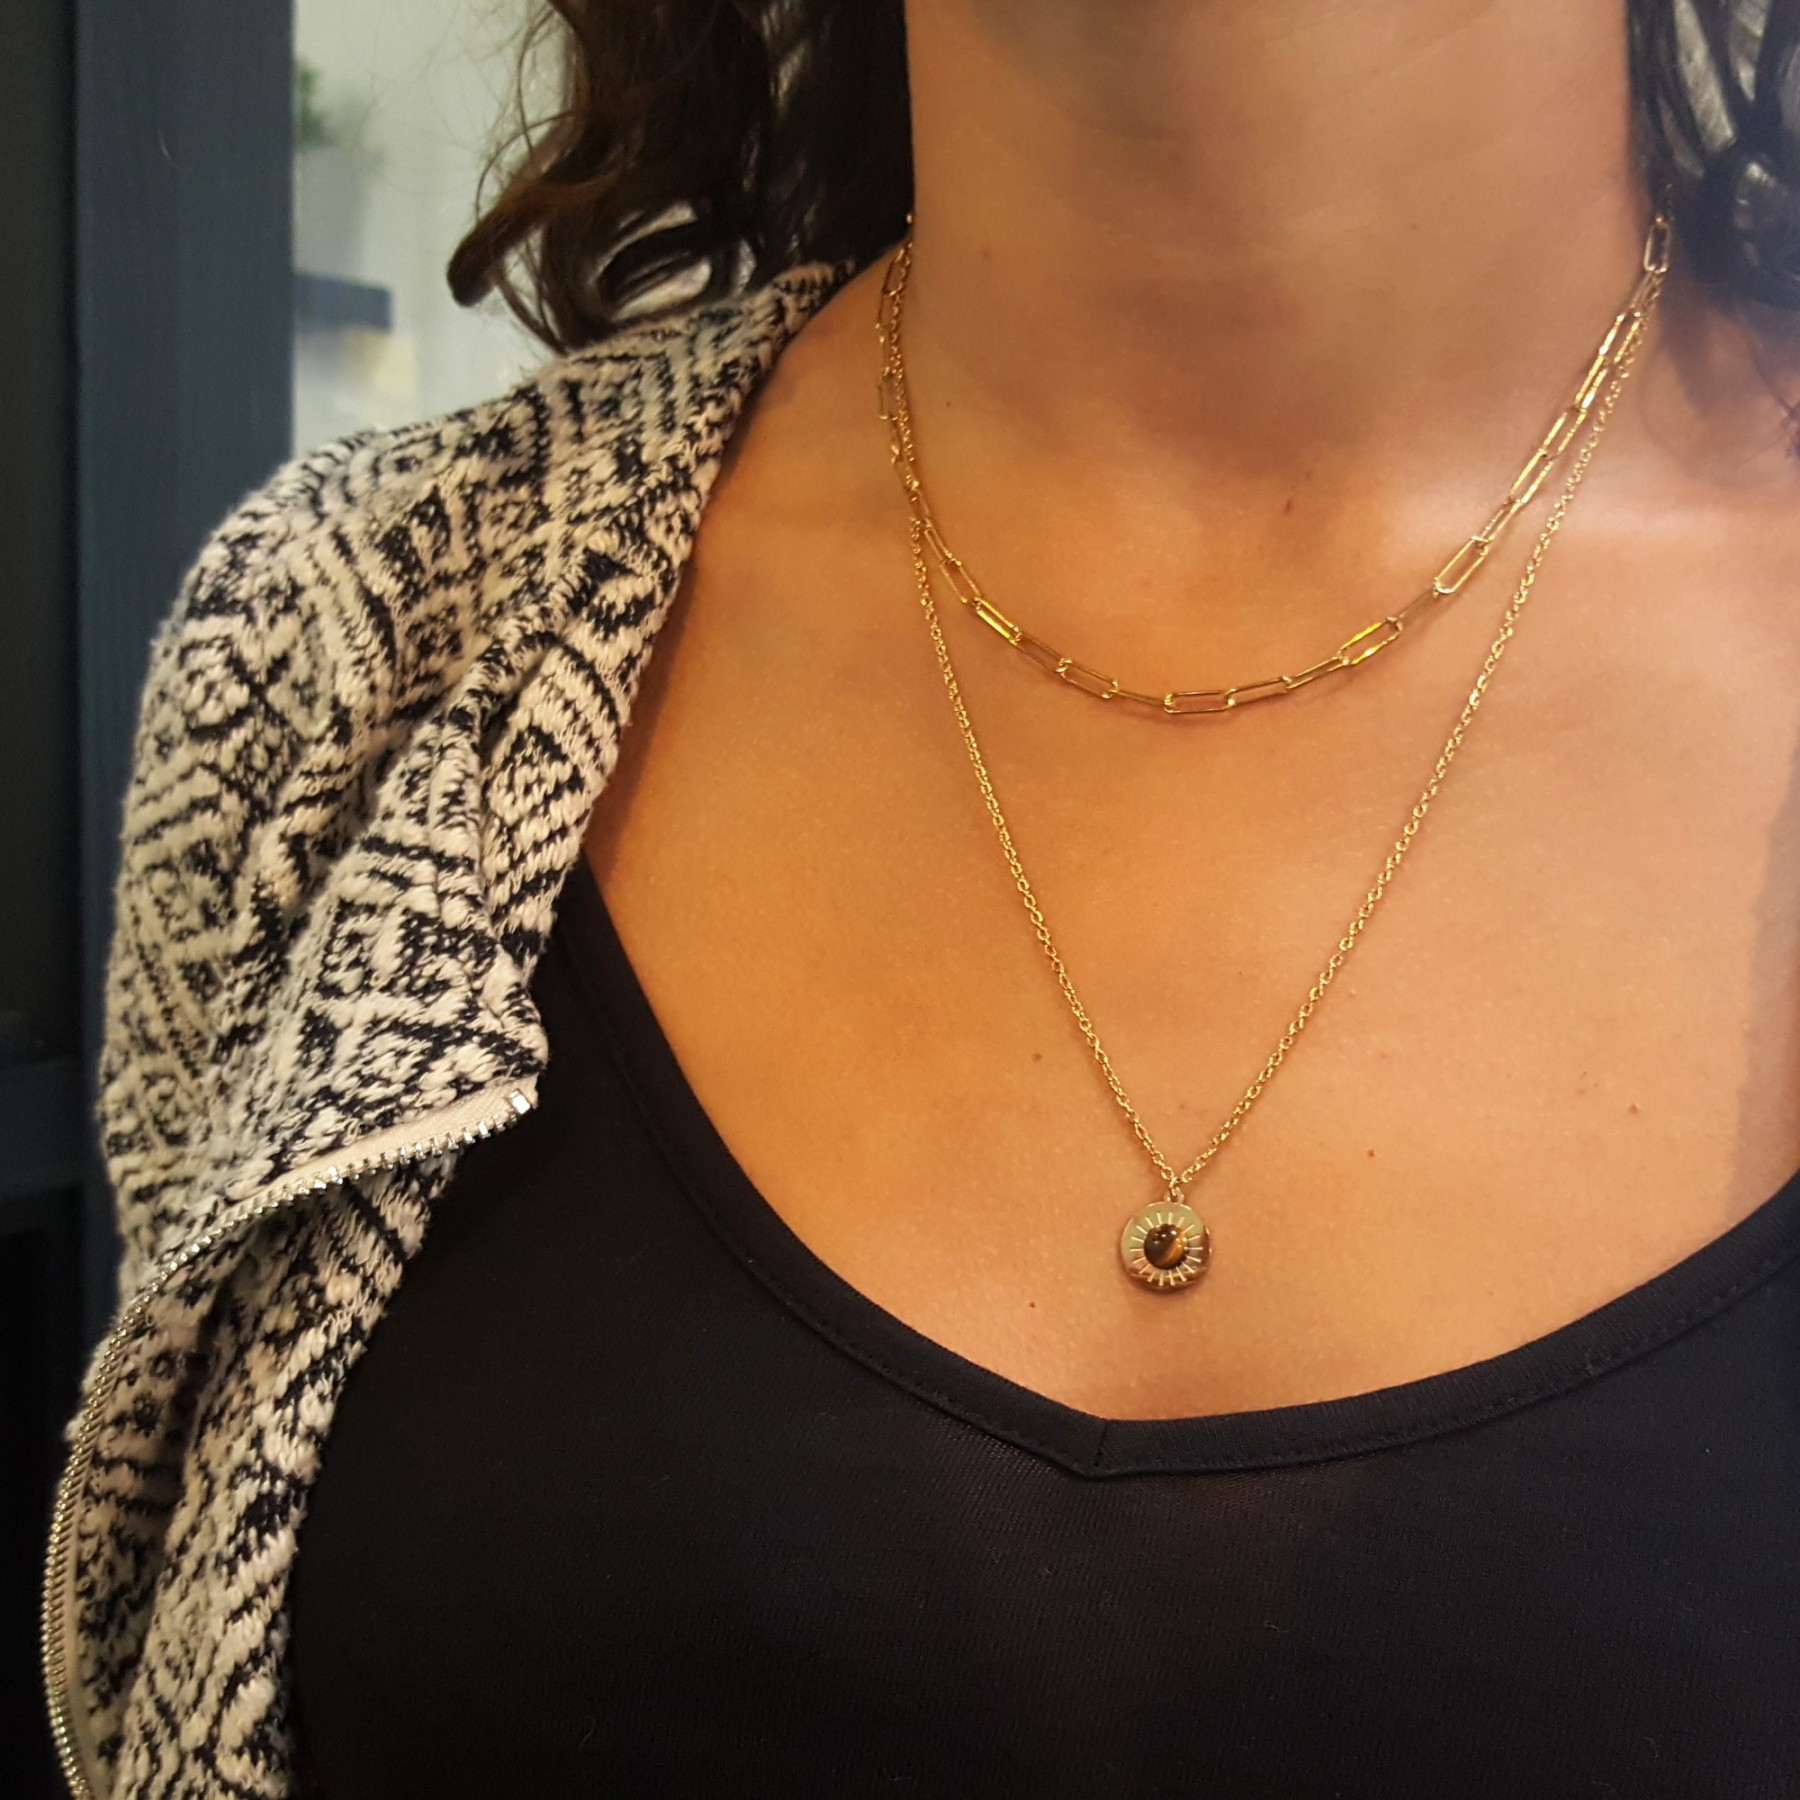 Collier double pendentif oeil de tigre